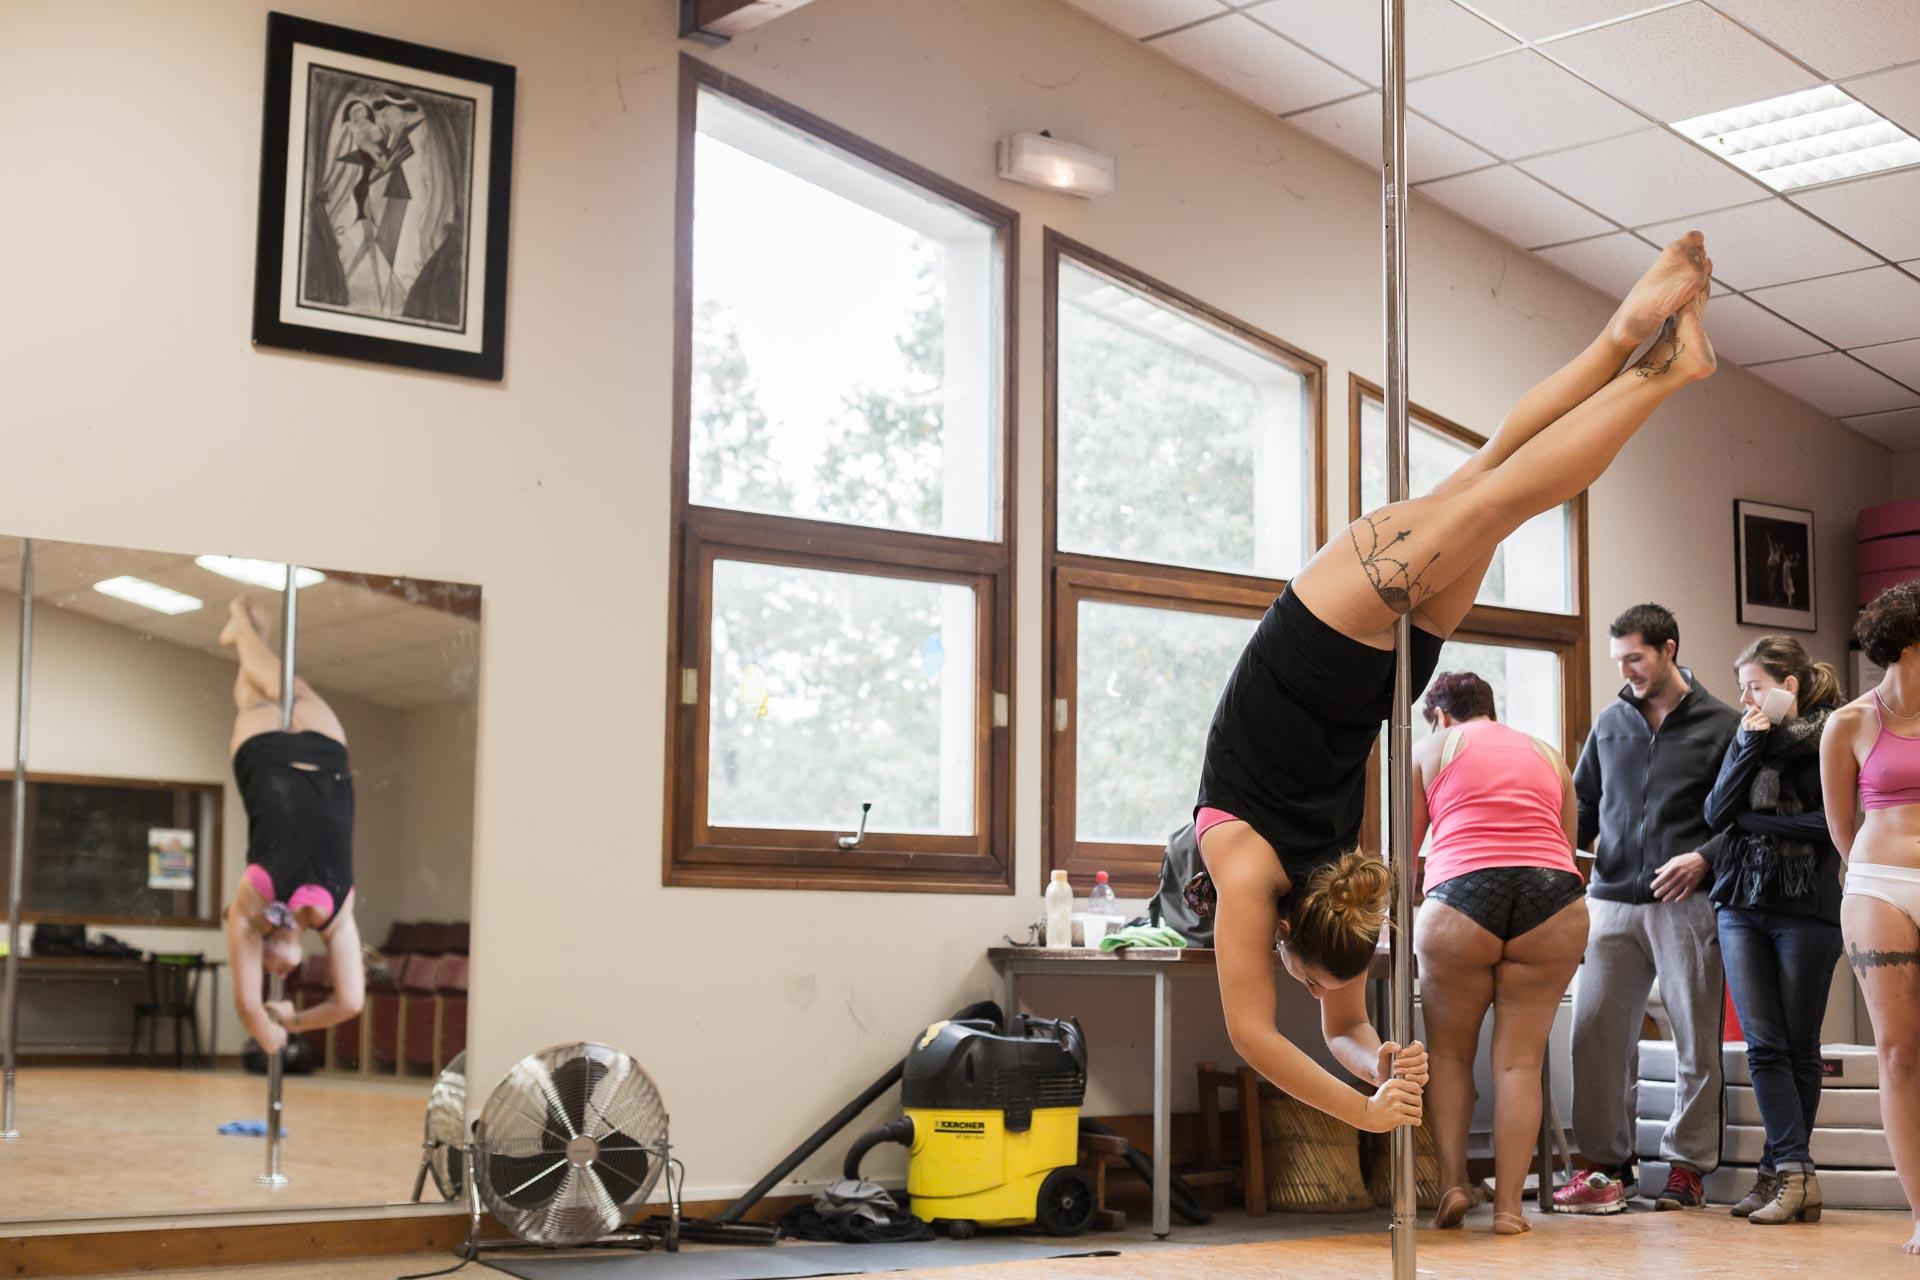 photographe-poitiers-pole-dance.jpg